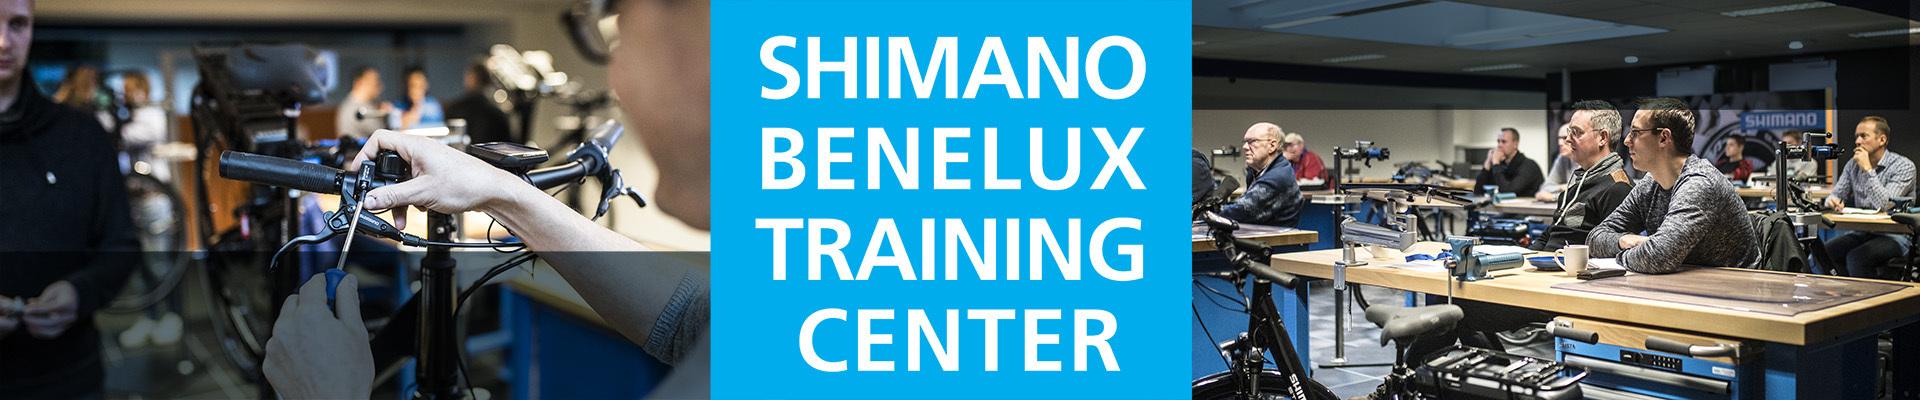 Shimano Benelux Training Center / Frans 2019 - 2020